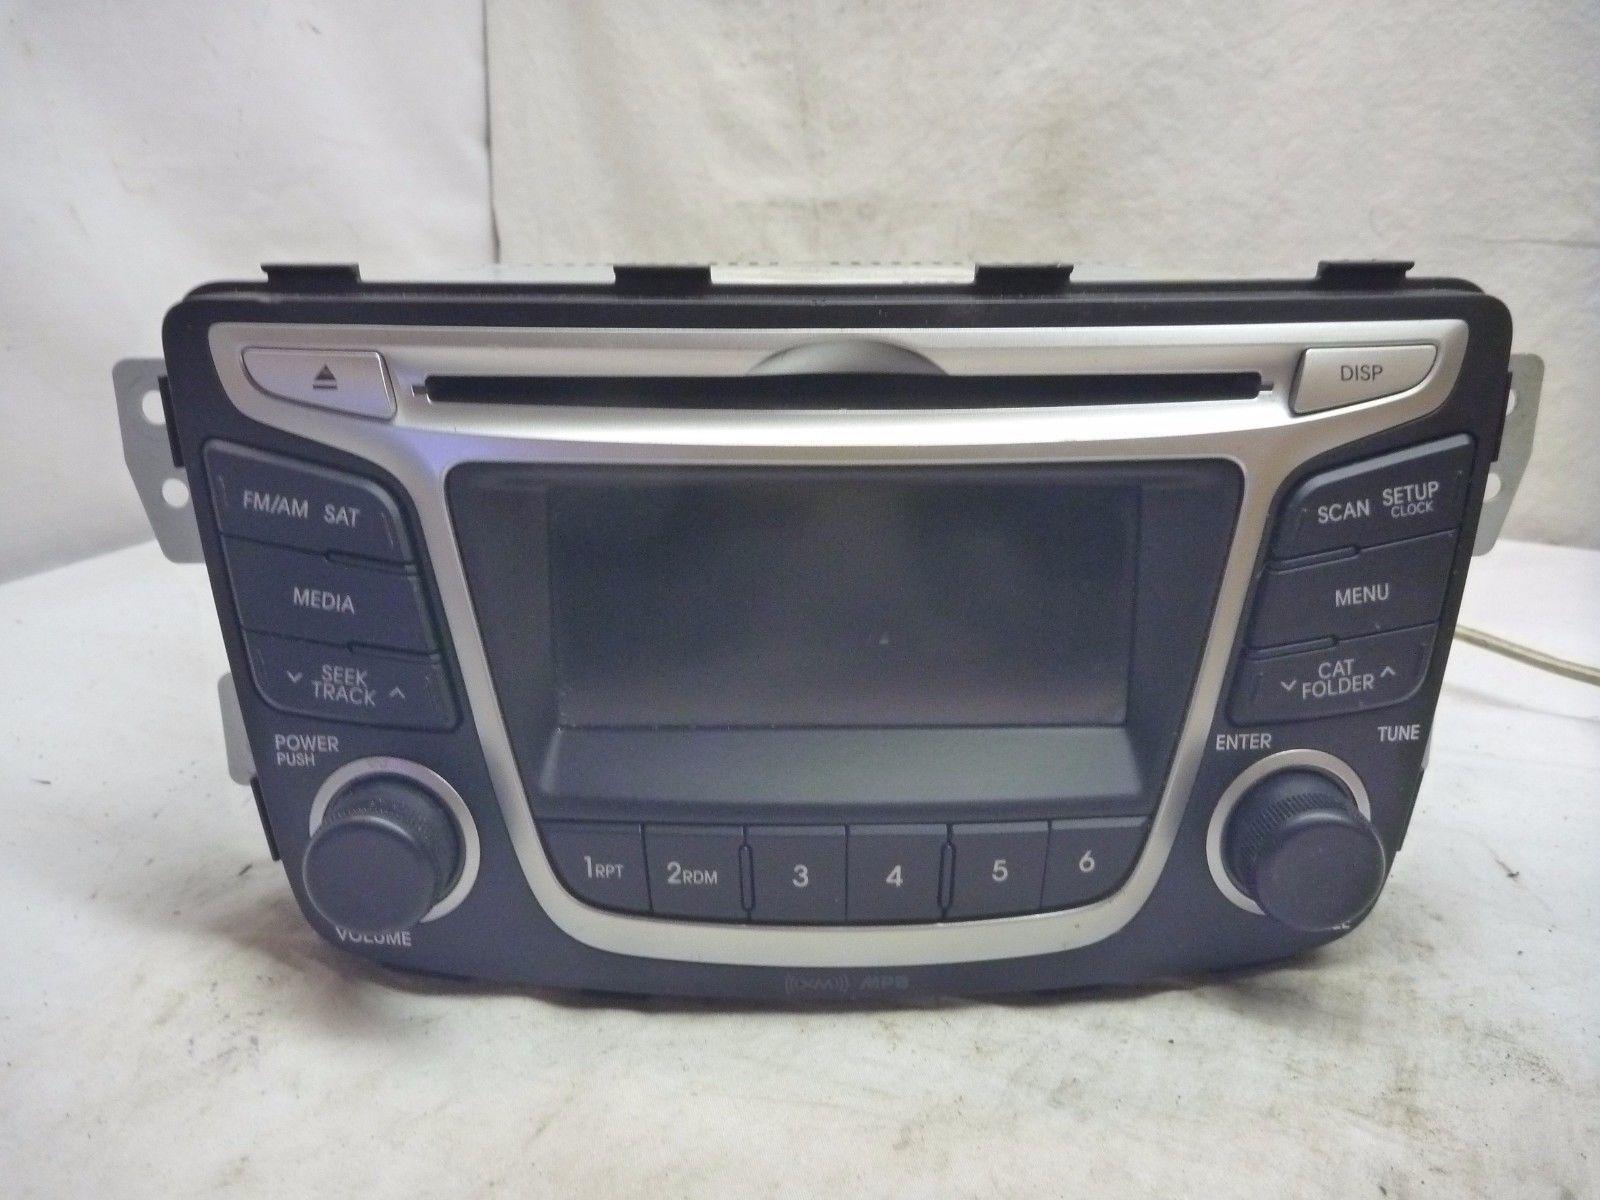 12 13 14 Hyundai Accent Radio Cd SAT Media Player 96170-1R1104X WY626